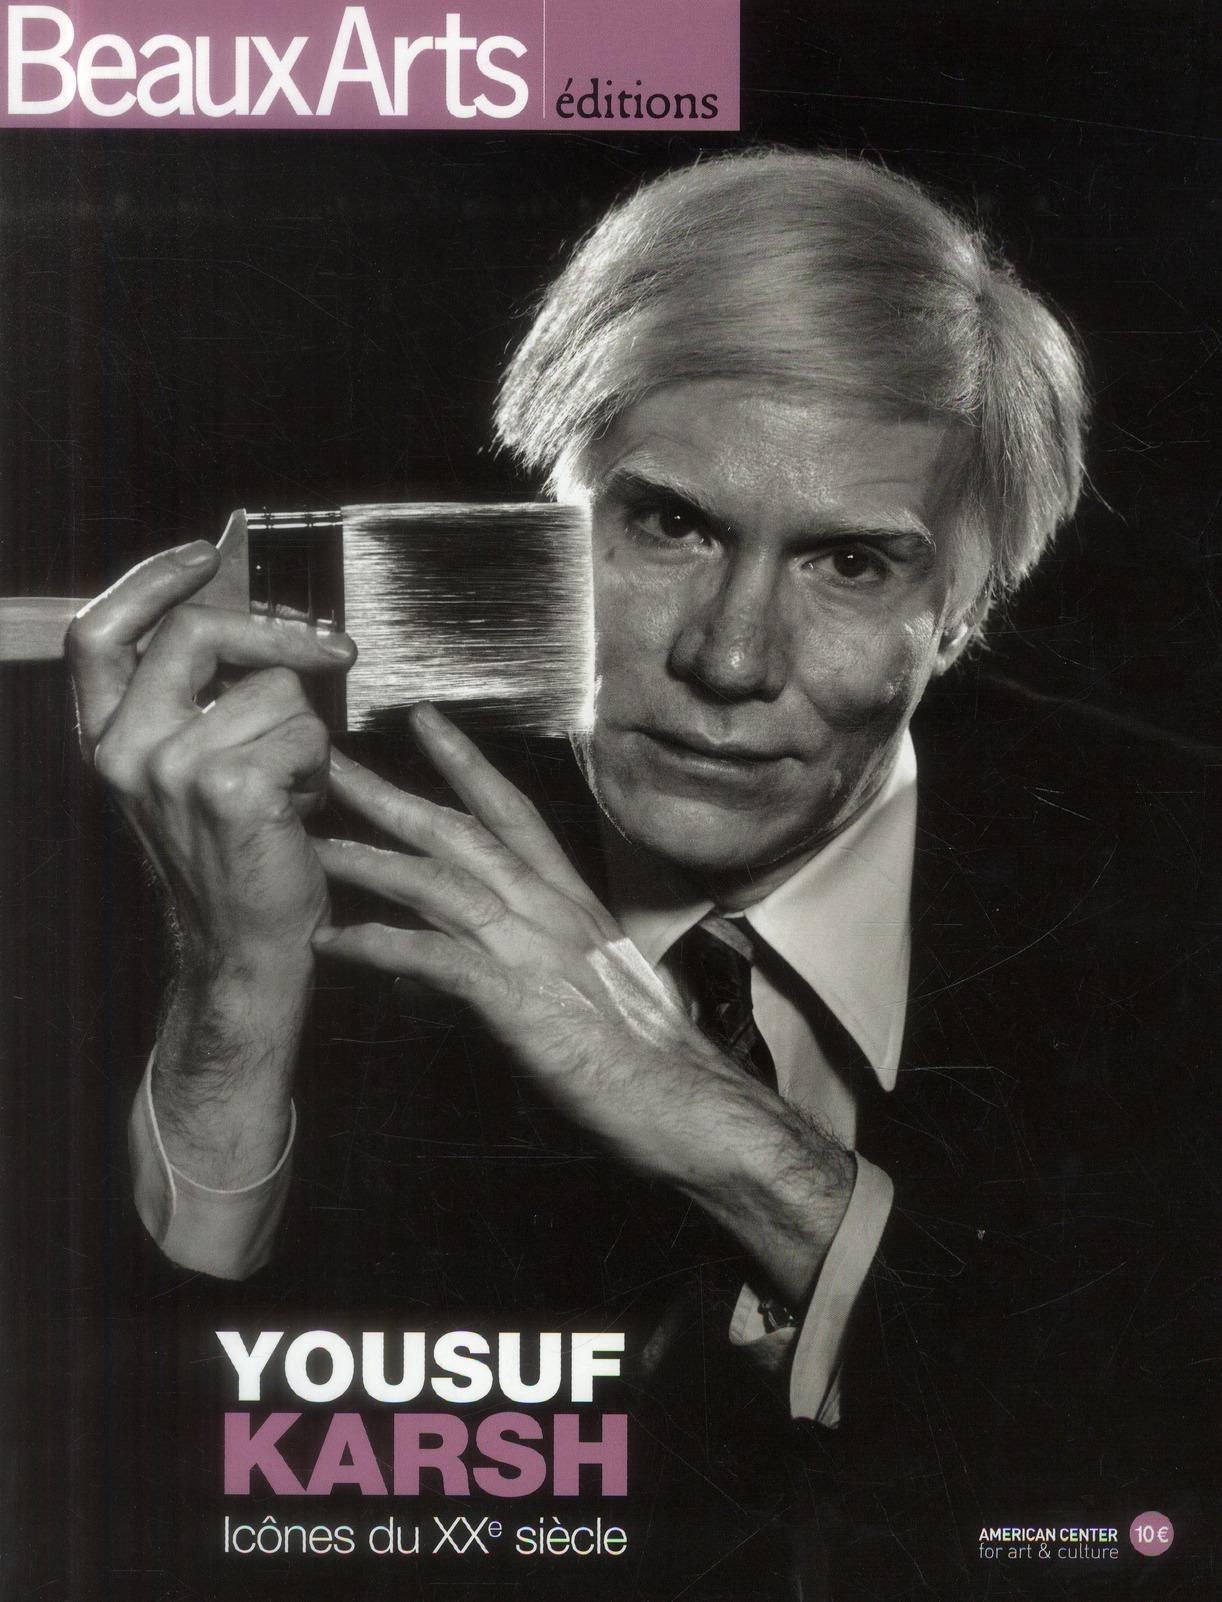 Yousuf karsh : icones du xxe siecle